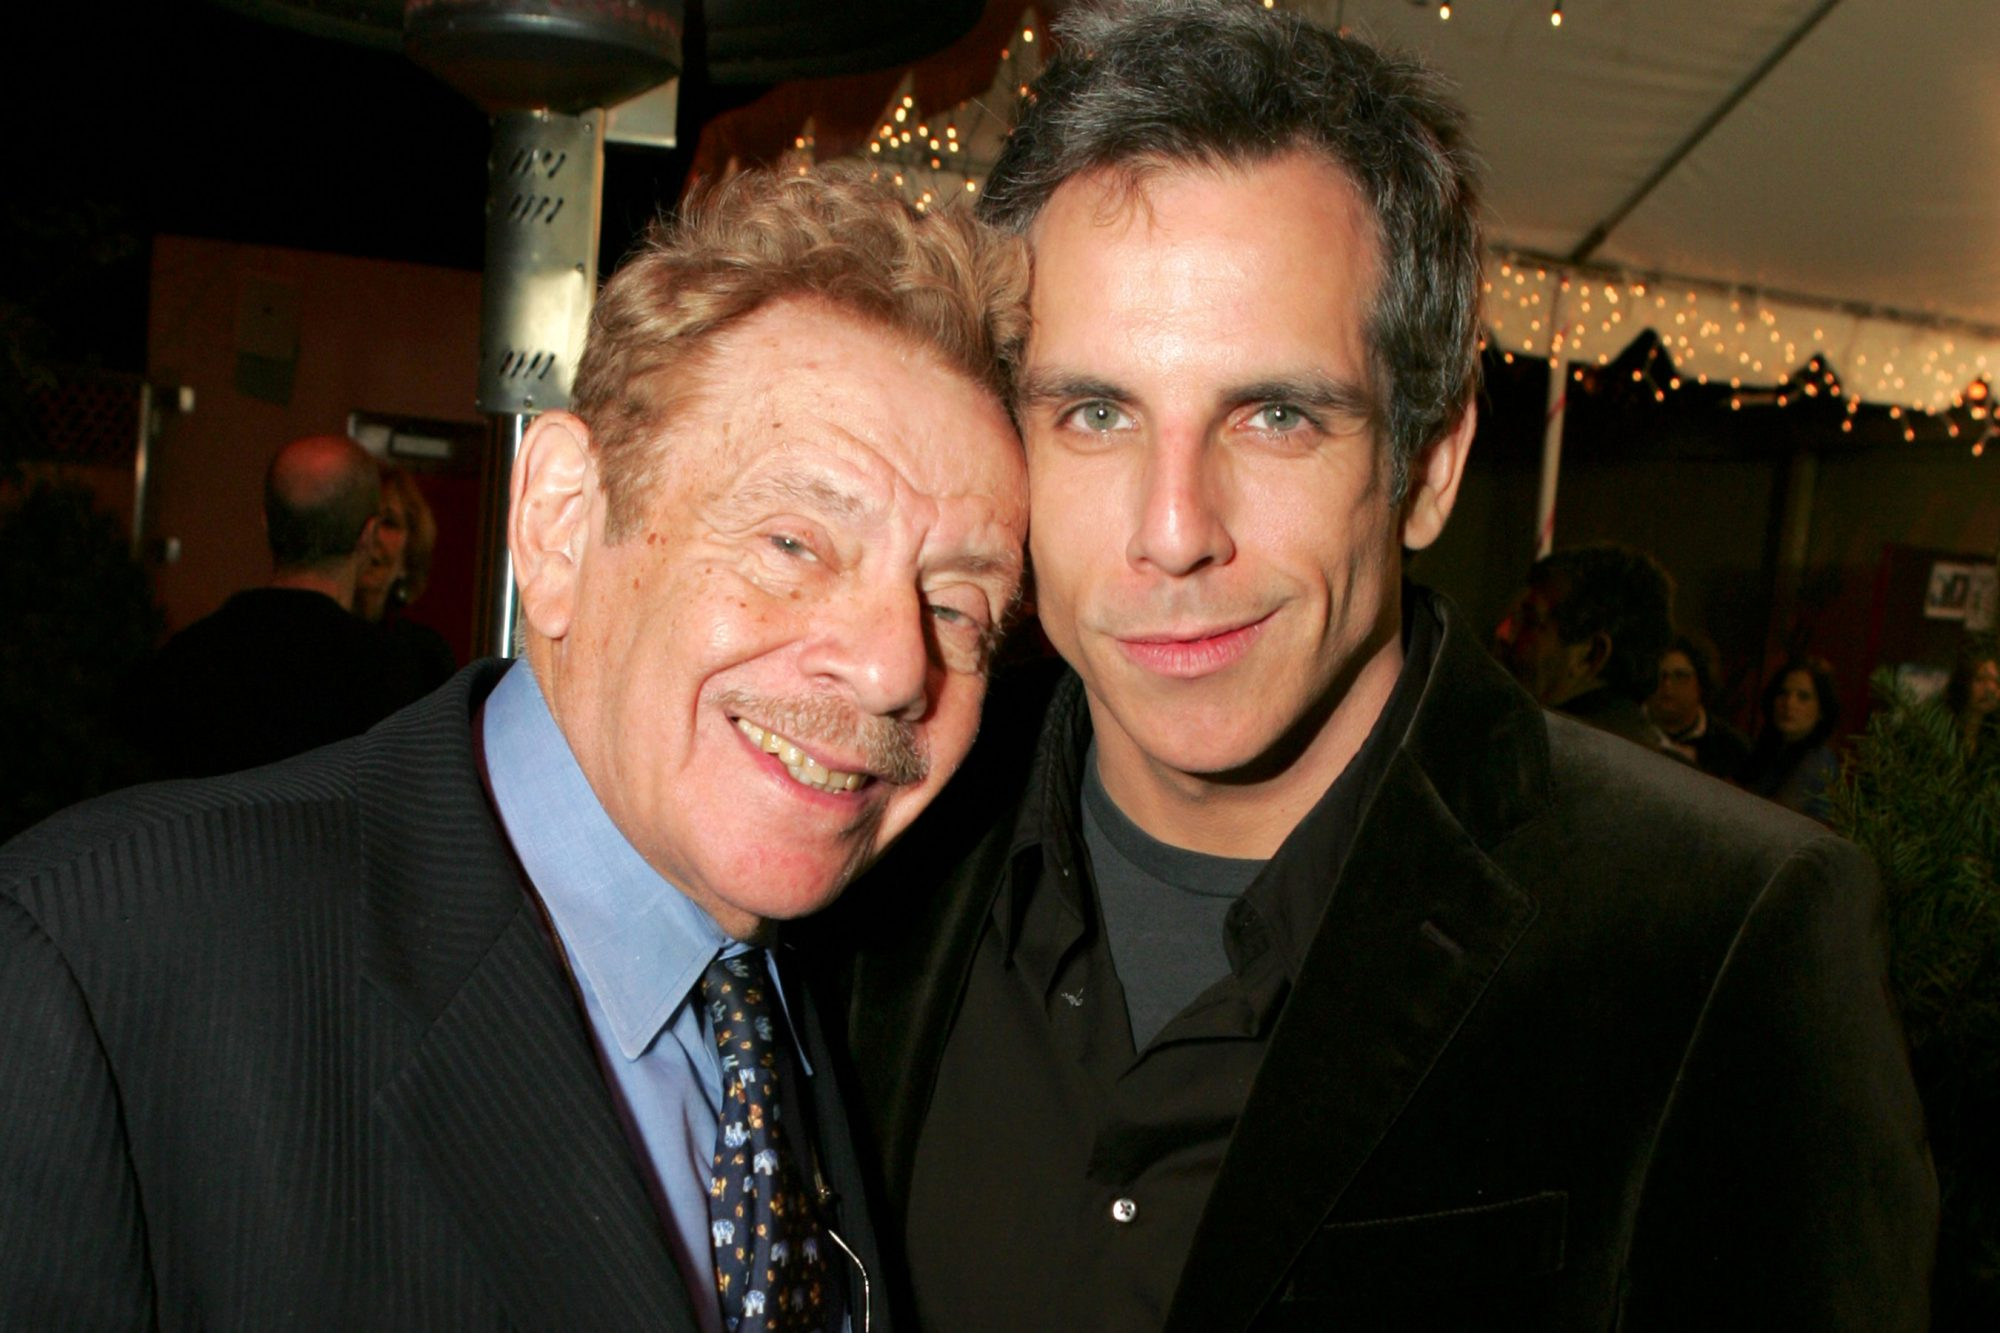 'MEET THE FOCKERS' FILM PREMIERE, LOS ANGELES, AMERICA - 16 DEC 2004